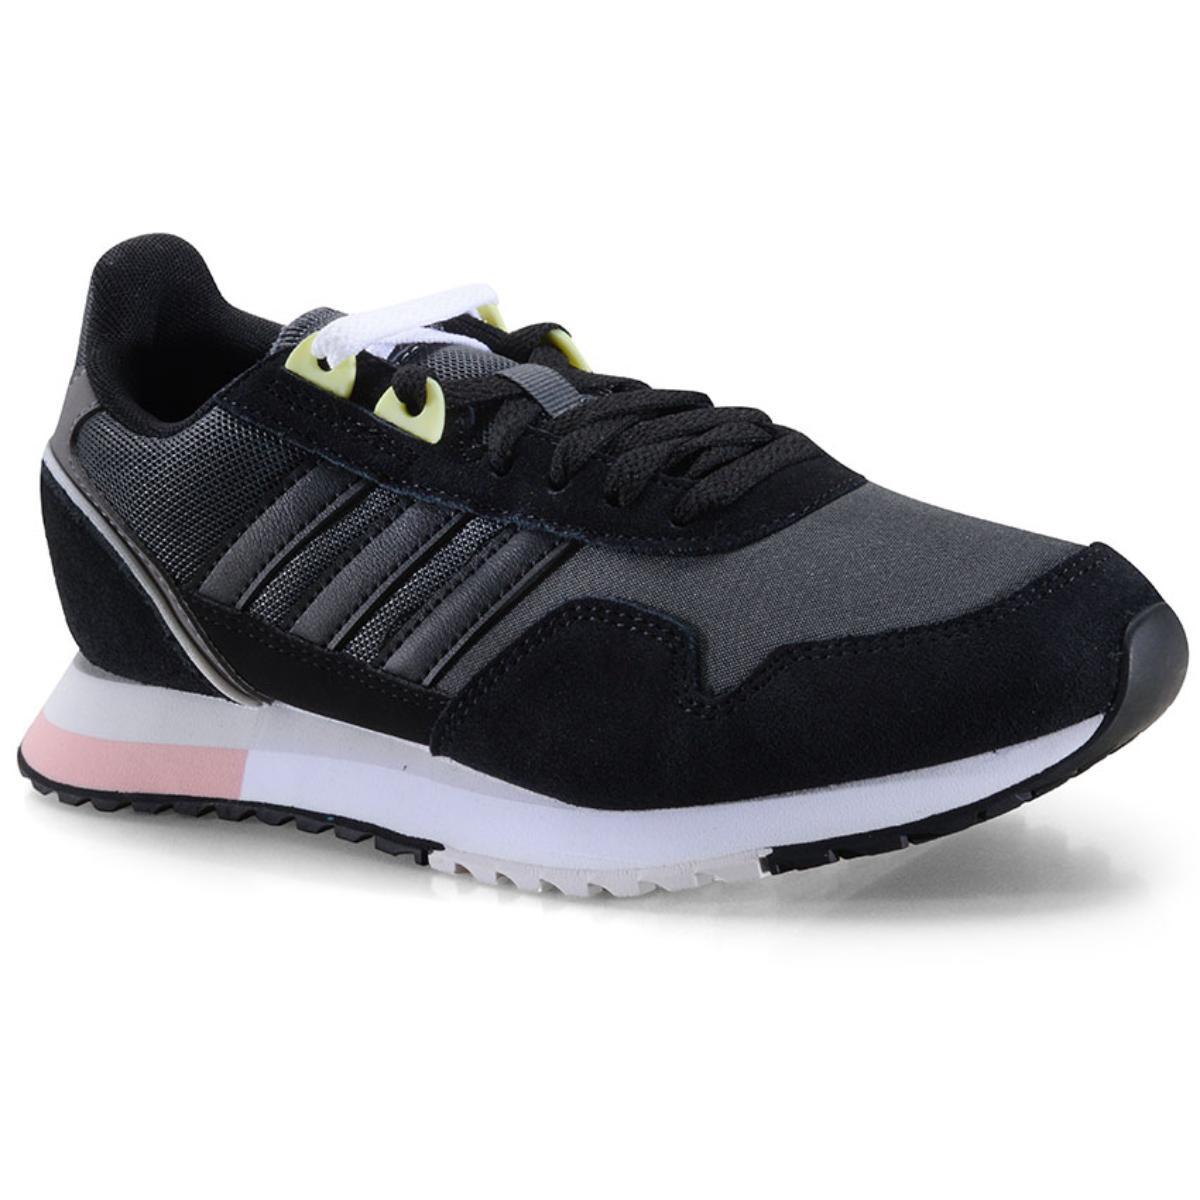 Tênis Feminino Adidas Eh1441 8k 2020 w Preto